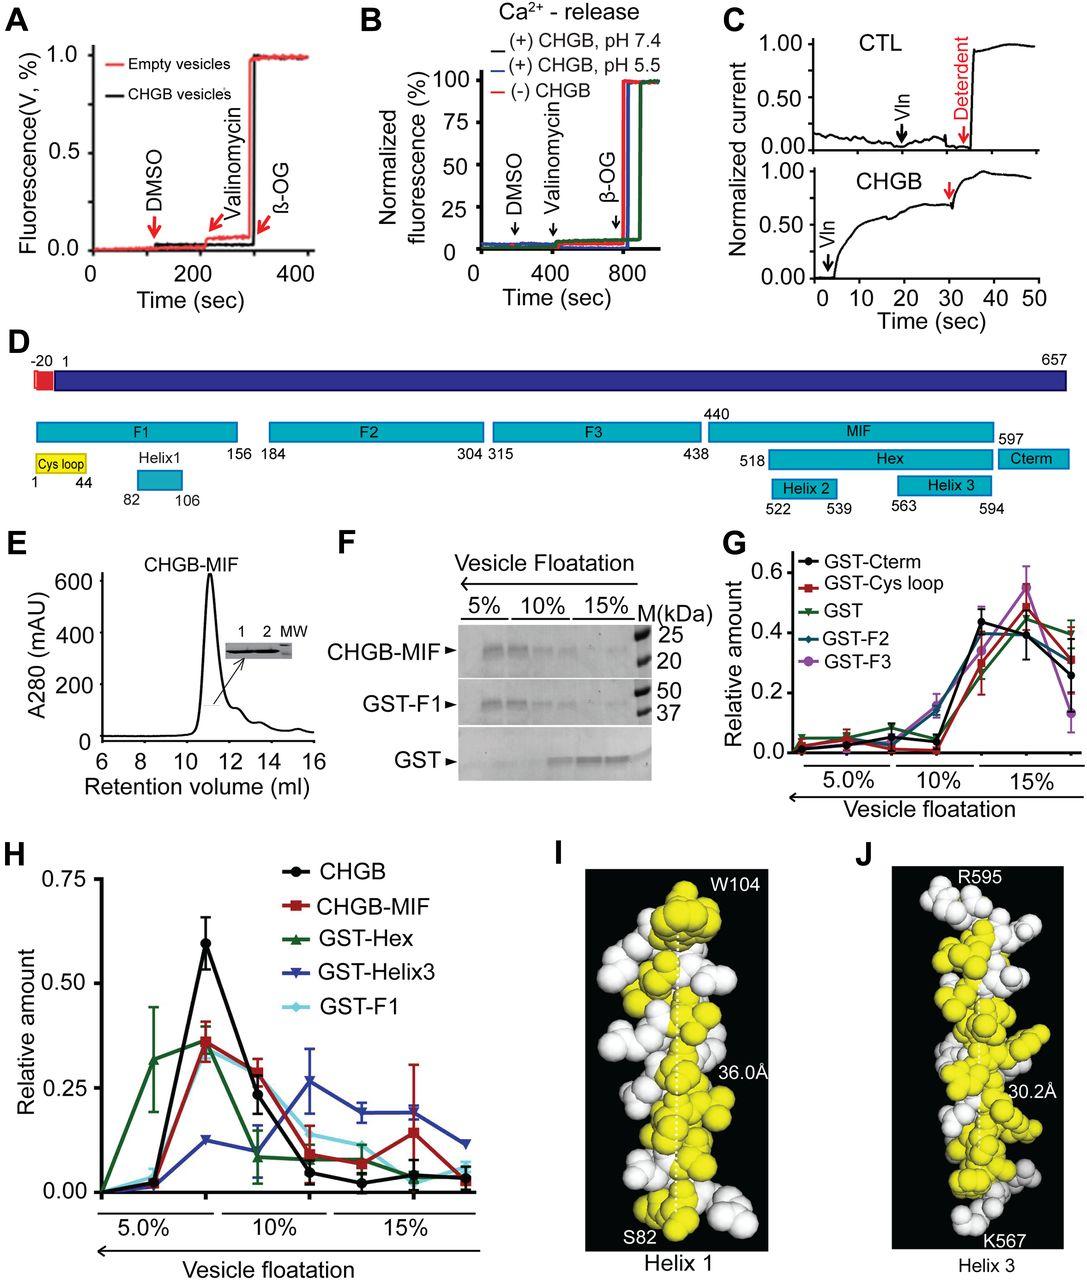 Secretory Granule Protein Chromogranin B Chgb Forms An Anion Thermo King Erc Tc Unit Wiring Schematic Diagram Manual Download Figure